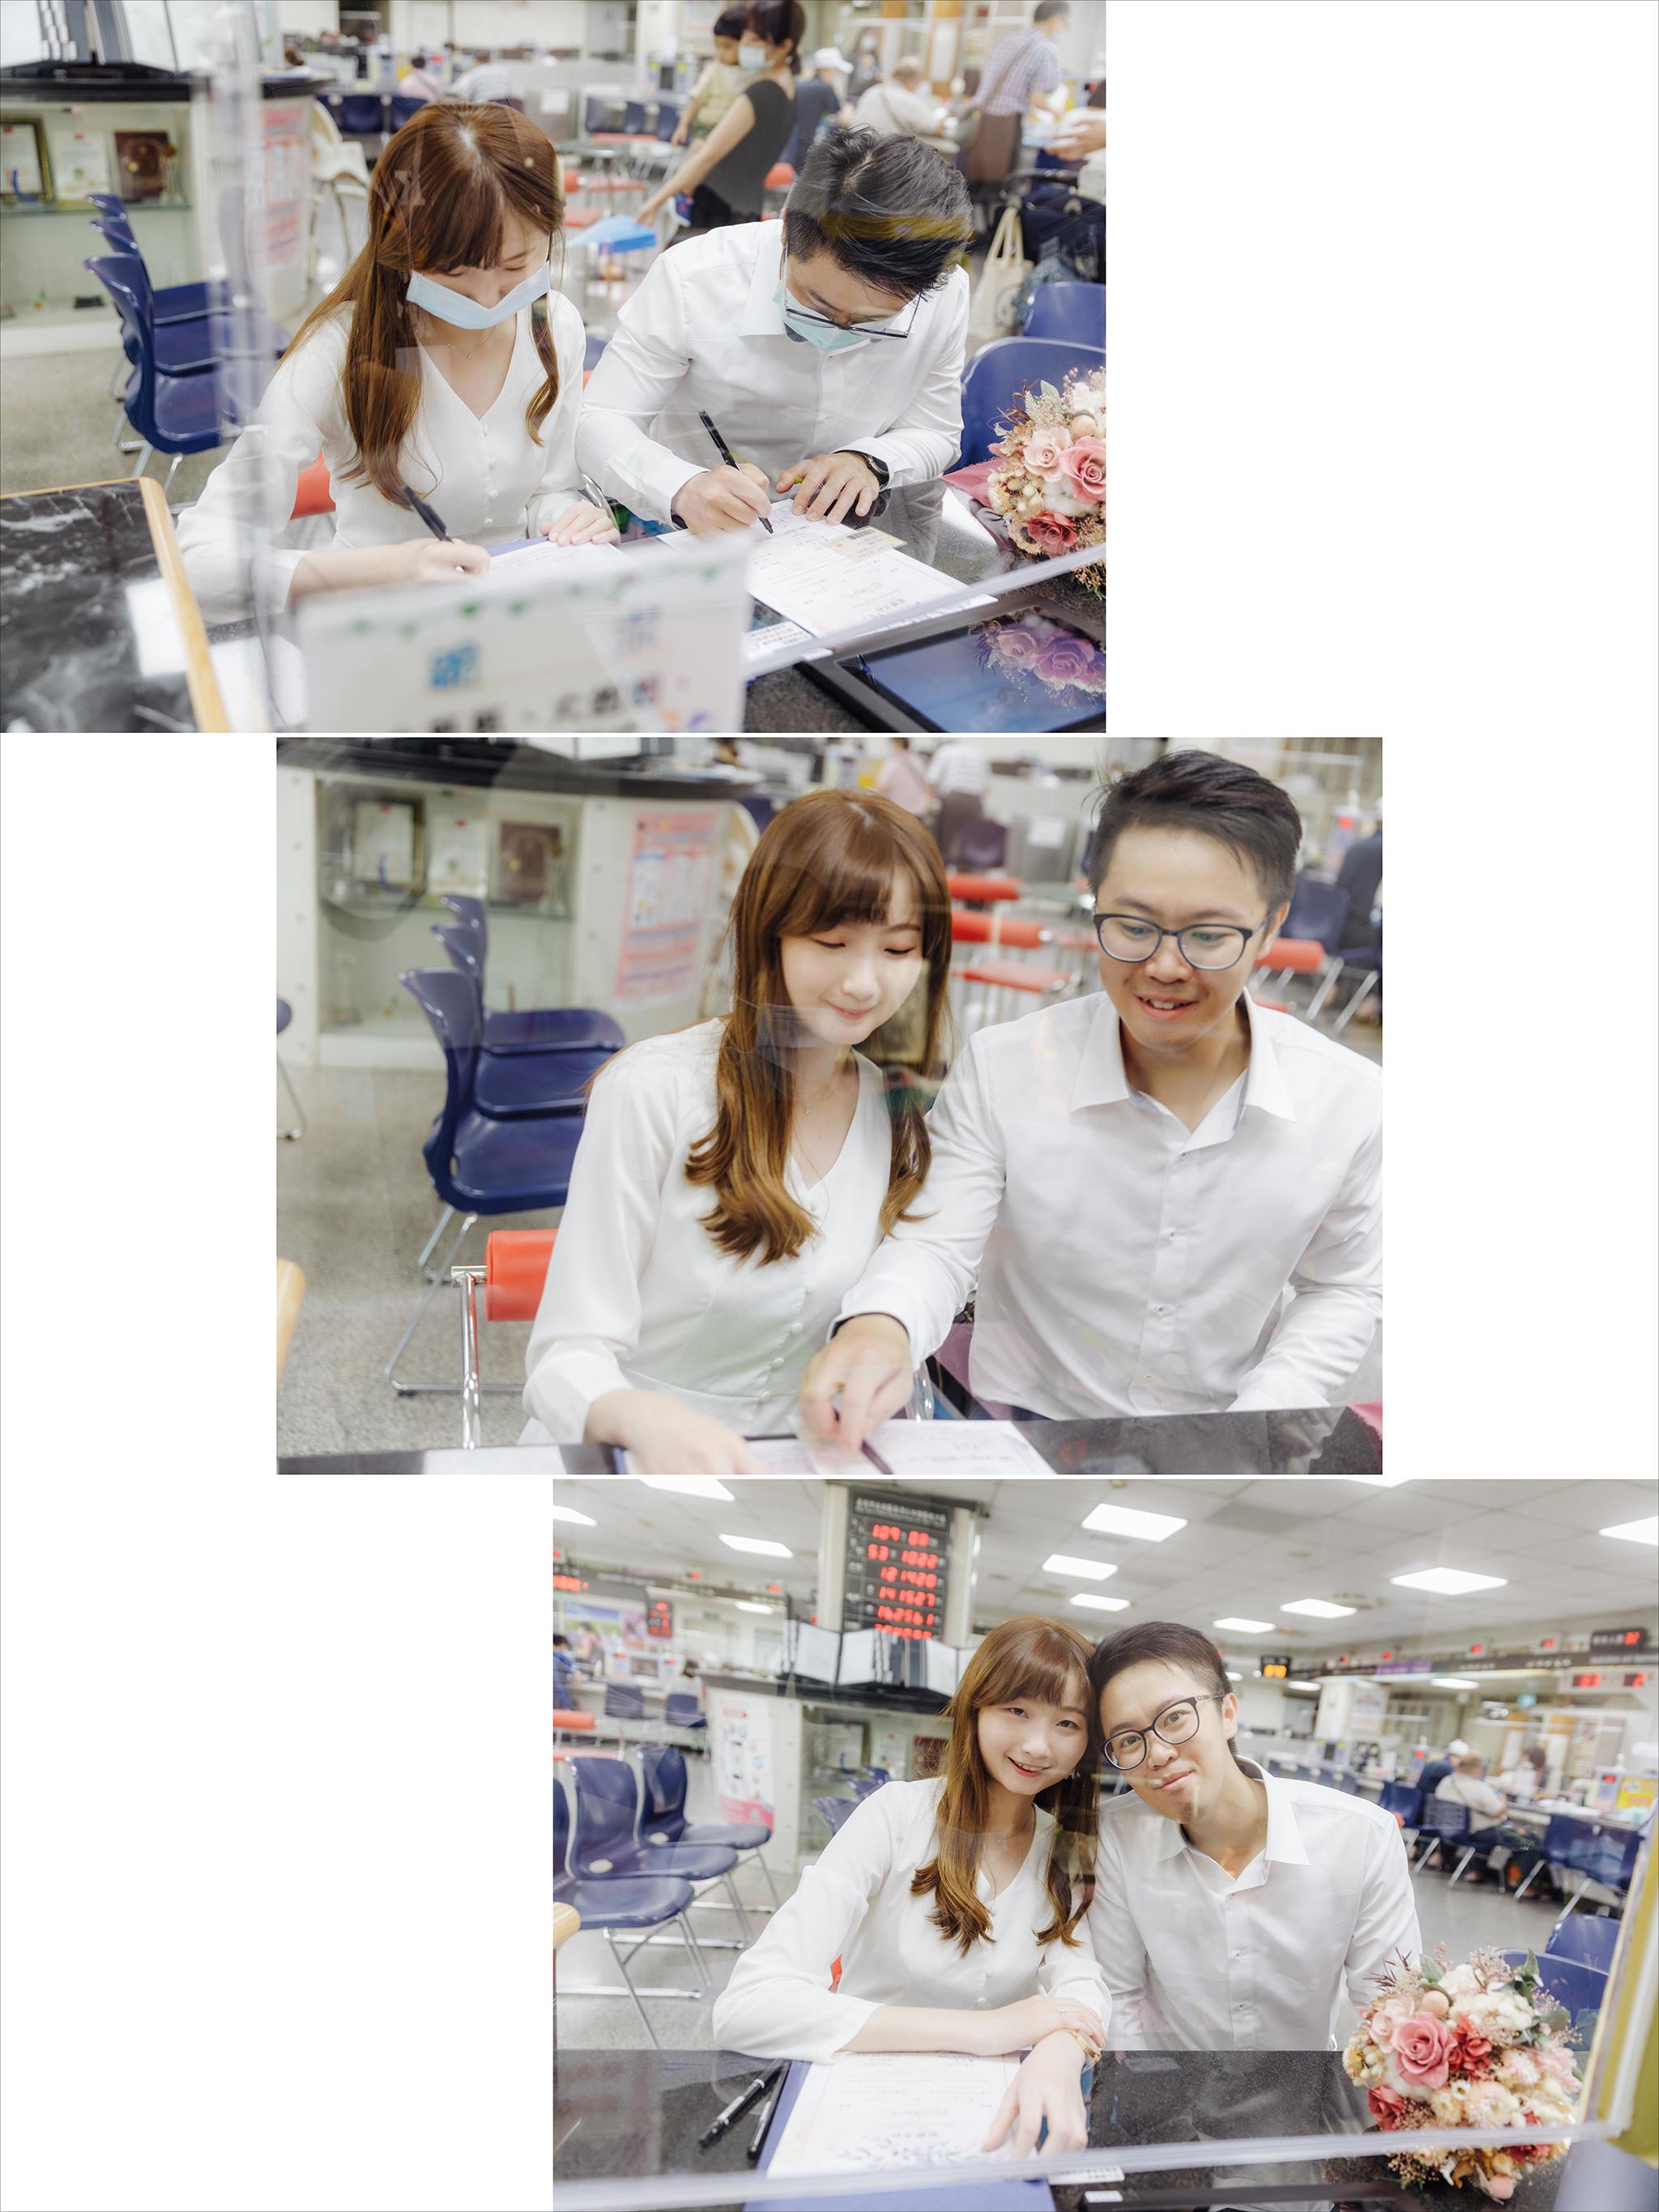 50667200693 bf79f0ca72 o - 【證婚寫真】+宏哲&菀琳+